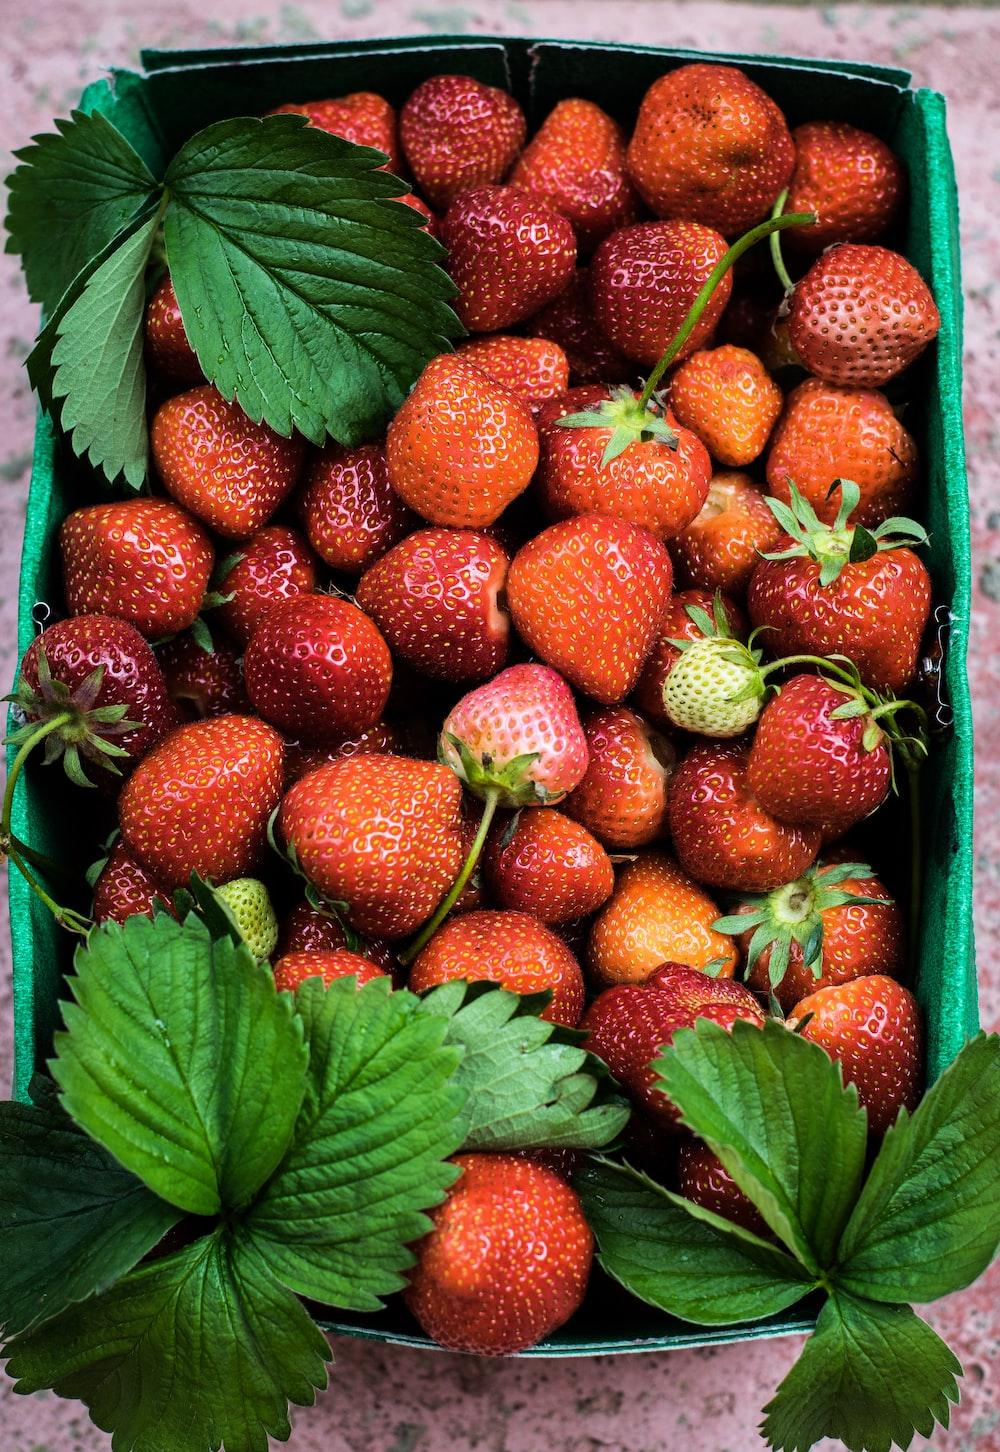 strawberry lot on basket